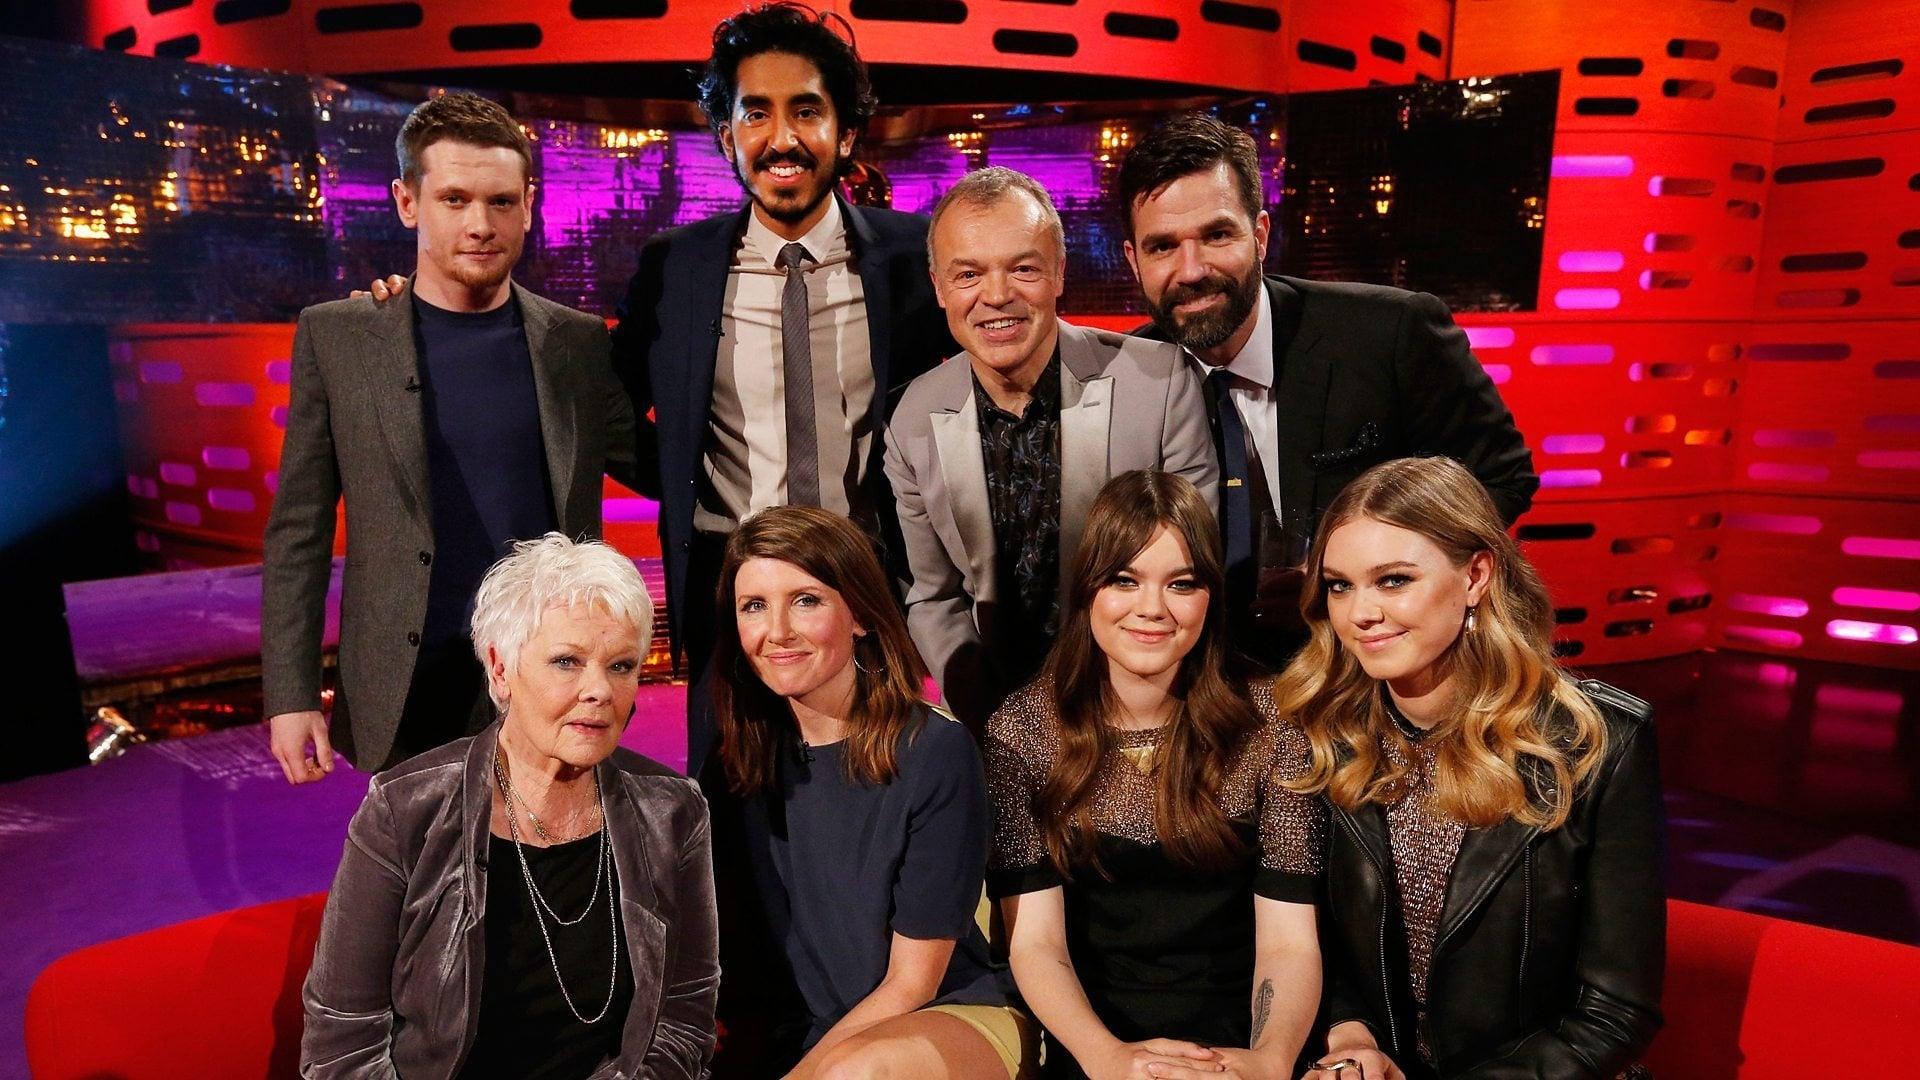 The Graham Norton Show Season 16 :Episode 16  Dame Judi Dench, Dev Patel, Sharon Horgan, Rob Delaney, Jack O'Connell, First Aid Kit